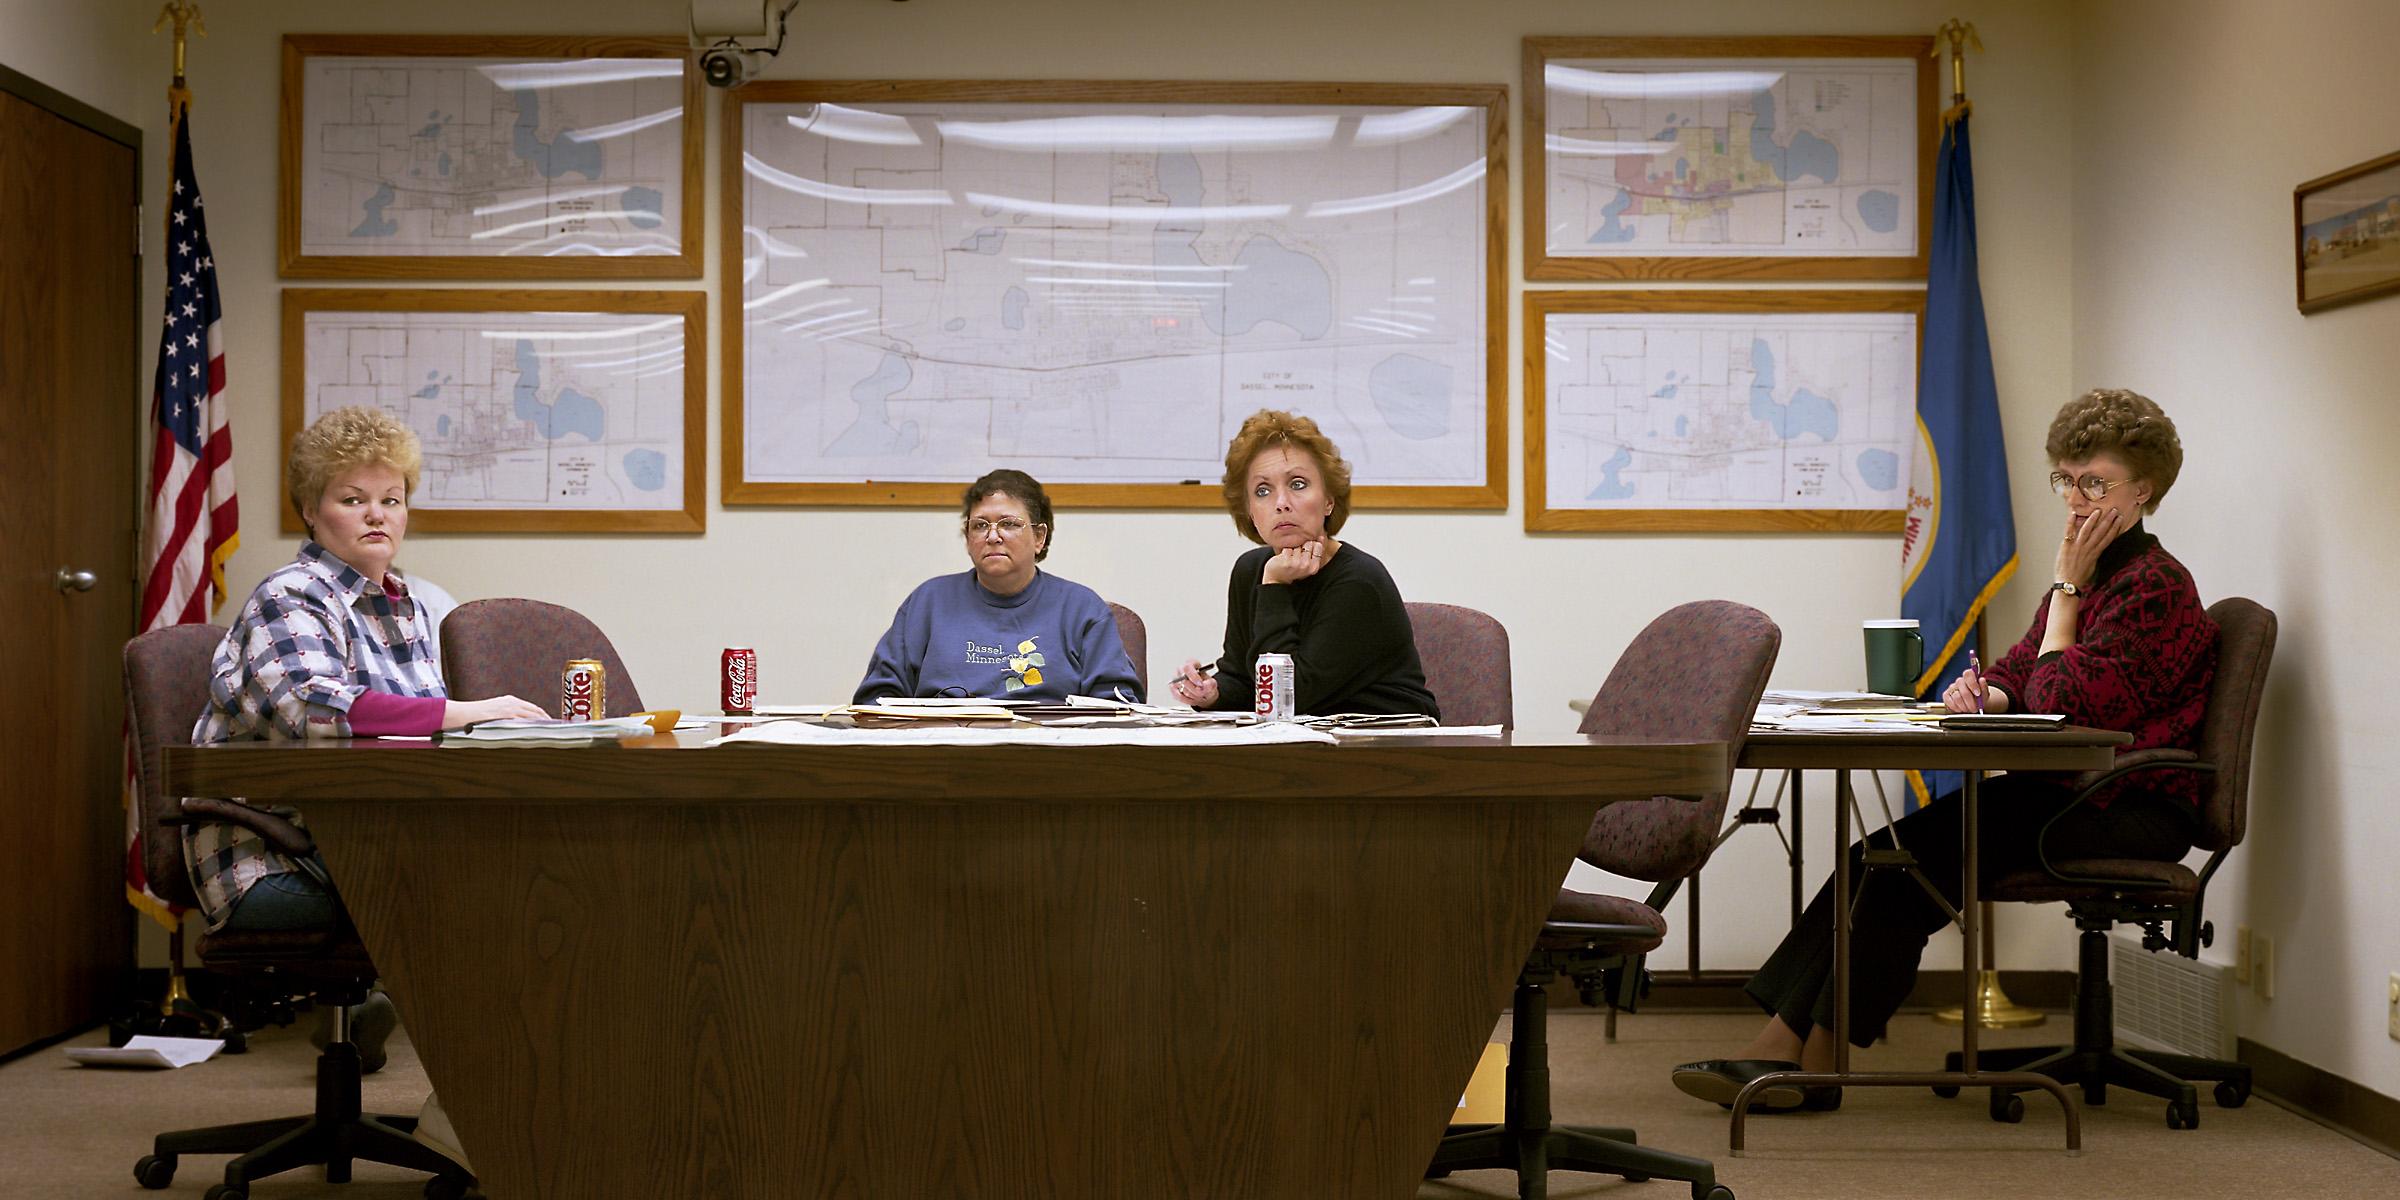 Dassel, Minnesota (population 1134) City Council, March 15, 1999 (L to R): Nancy Nicholson, Ava Flachmeyer (Mayor), Jan Casey, Sherlyn Bjork (Deputy Clerk), 1999.